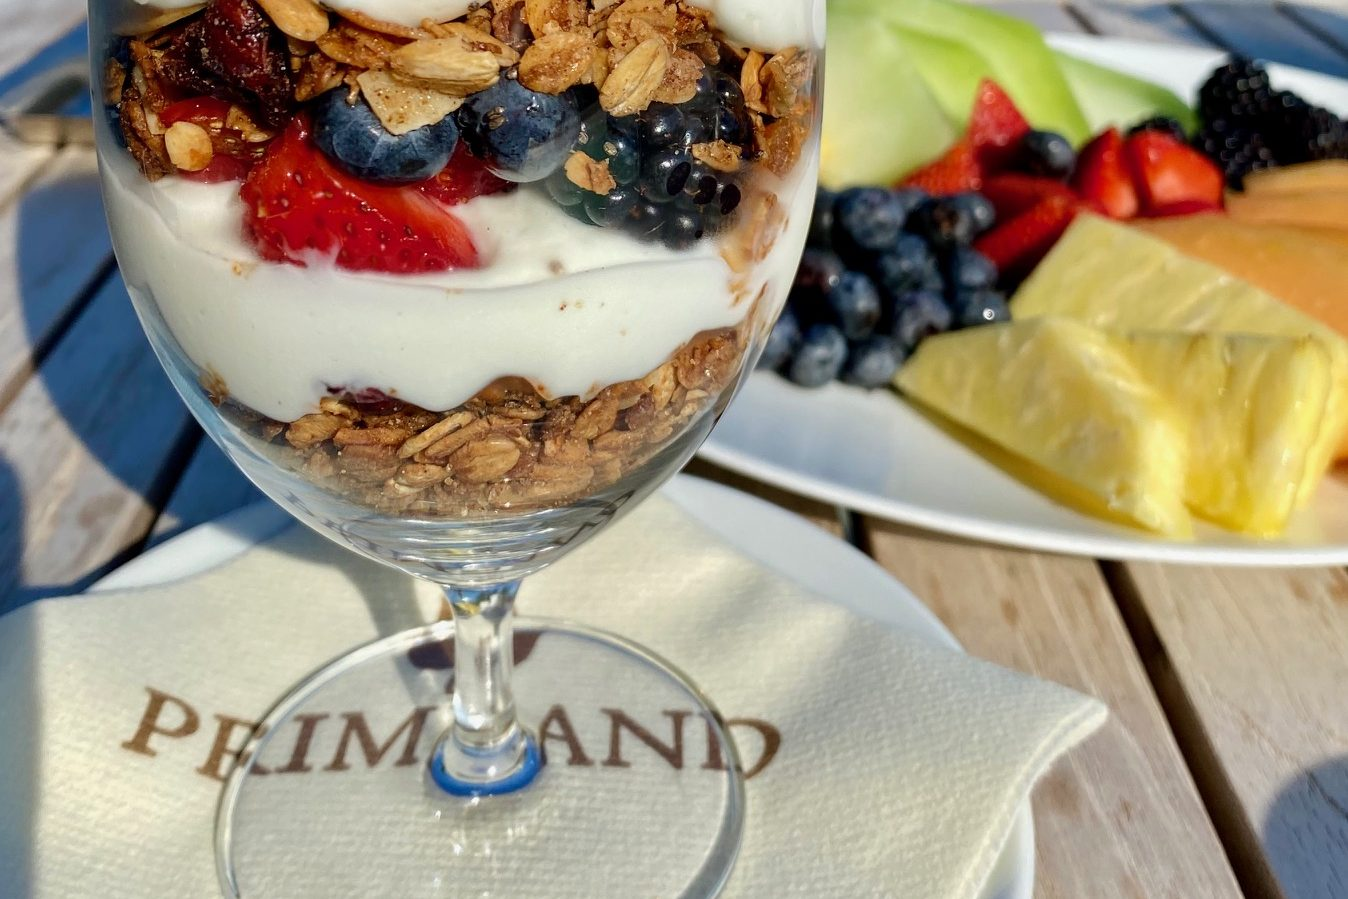 Dining at the Primland Resort